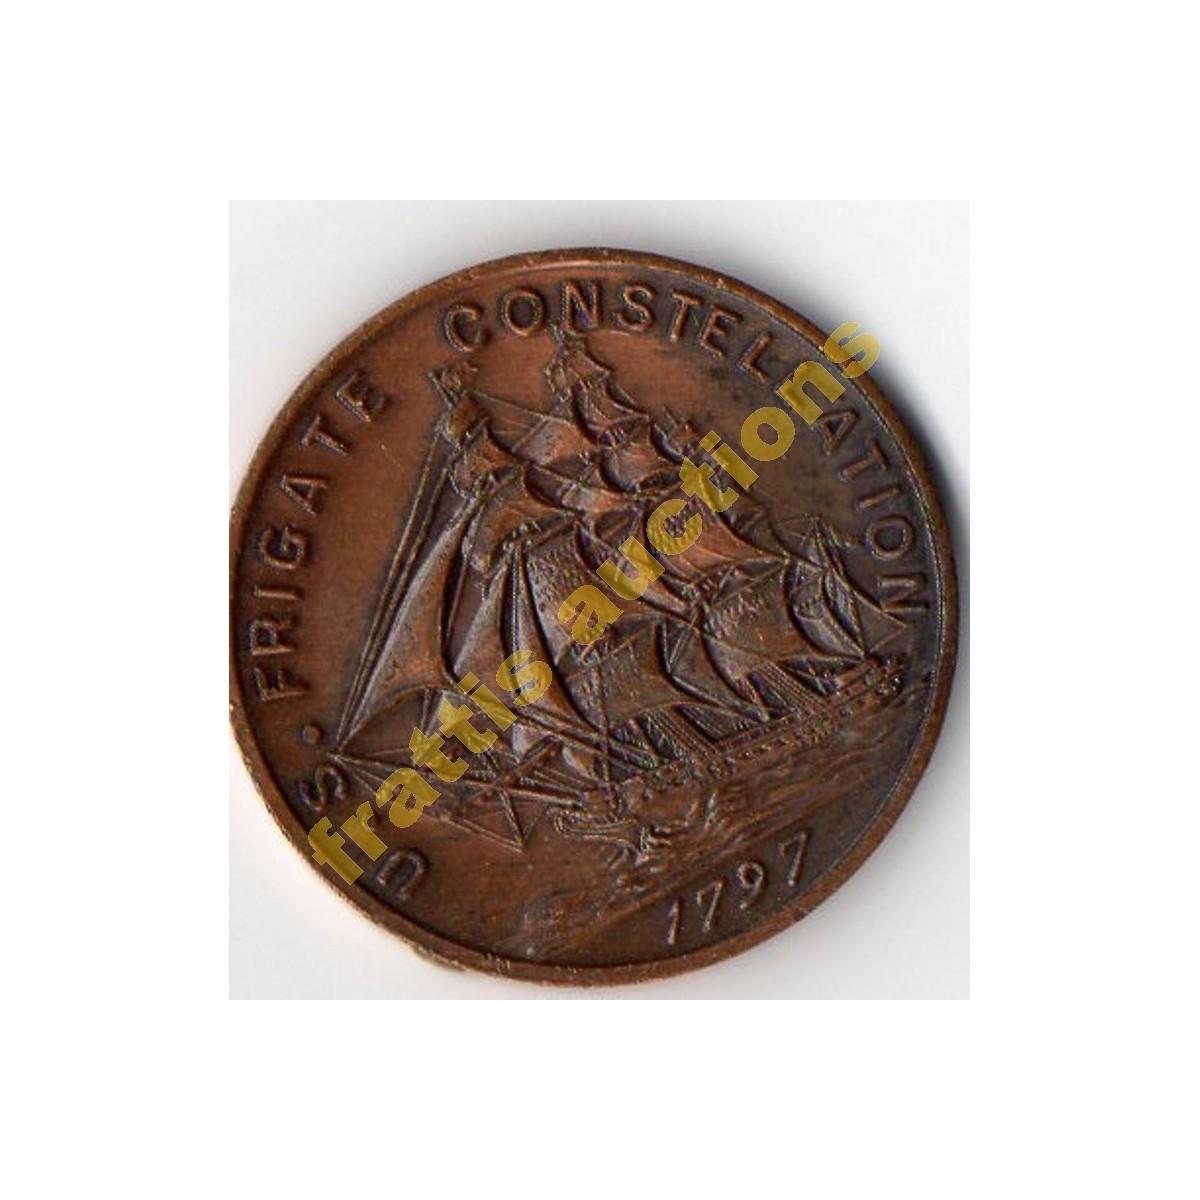 US Frigate Constellation 1797,αναμνηστικό νόμισμα.